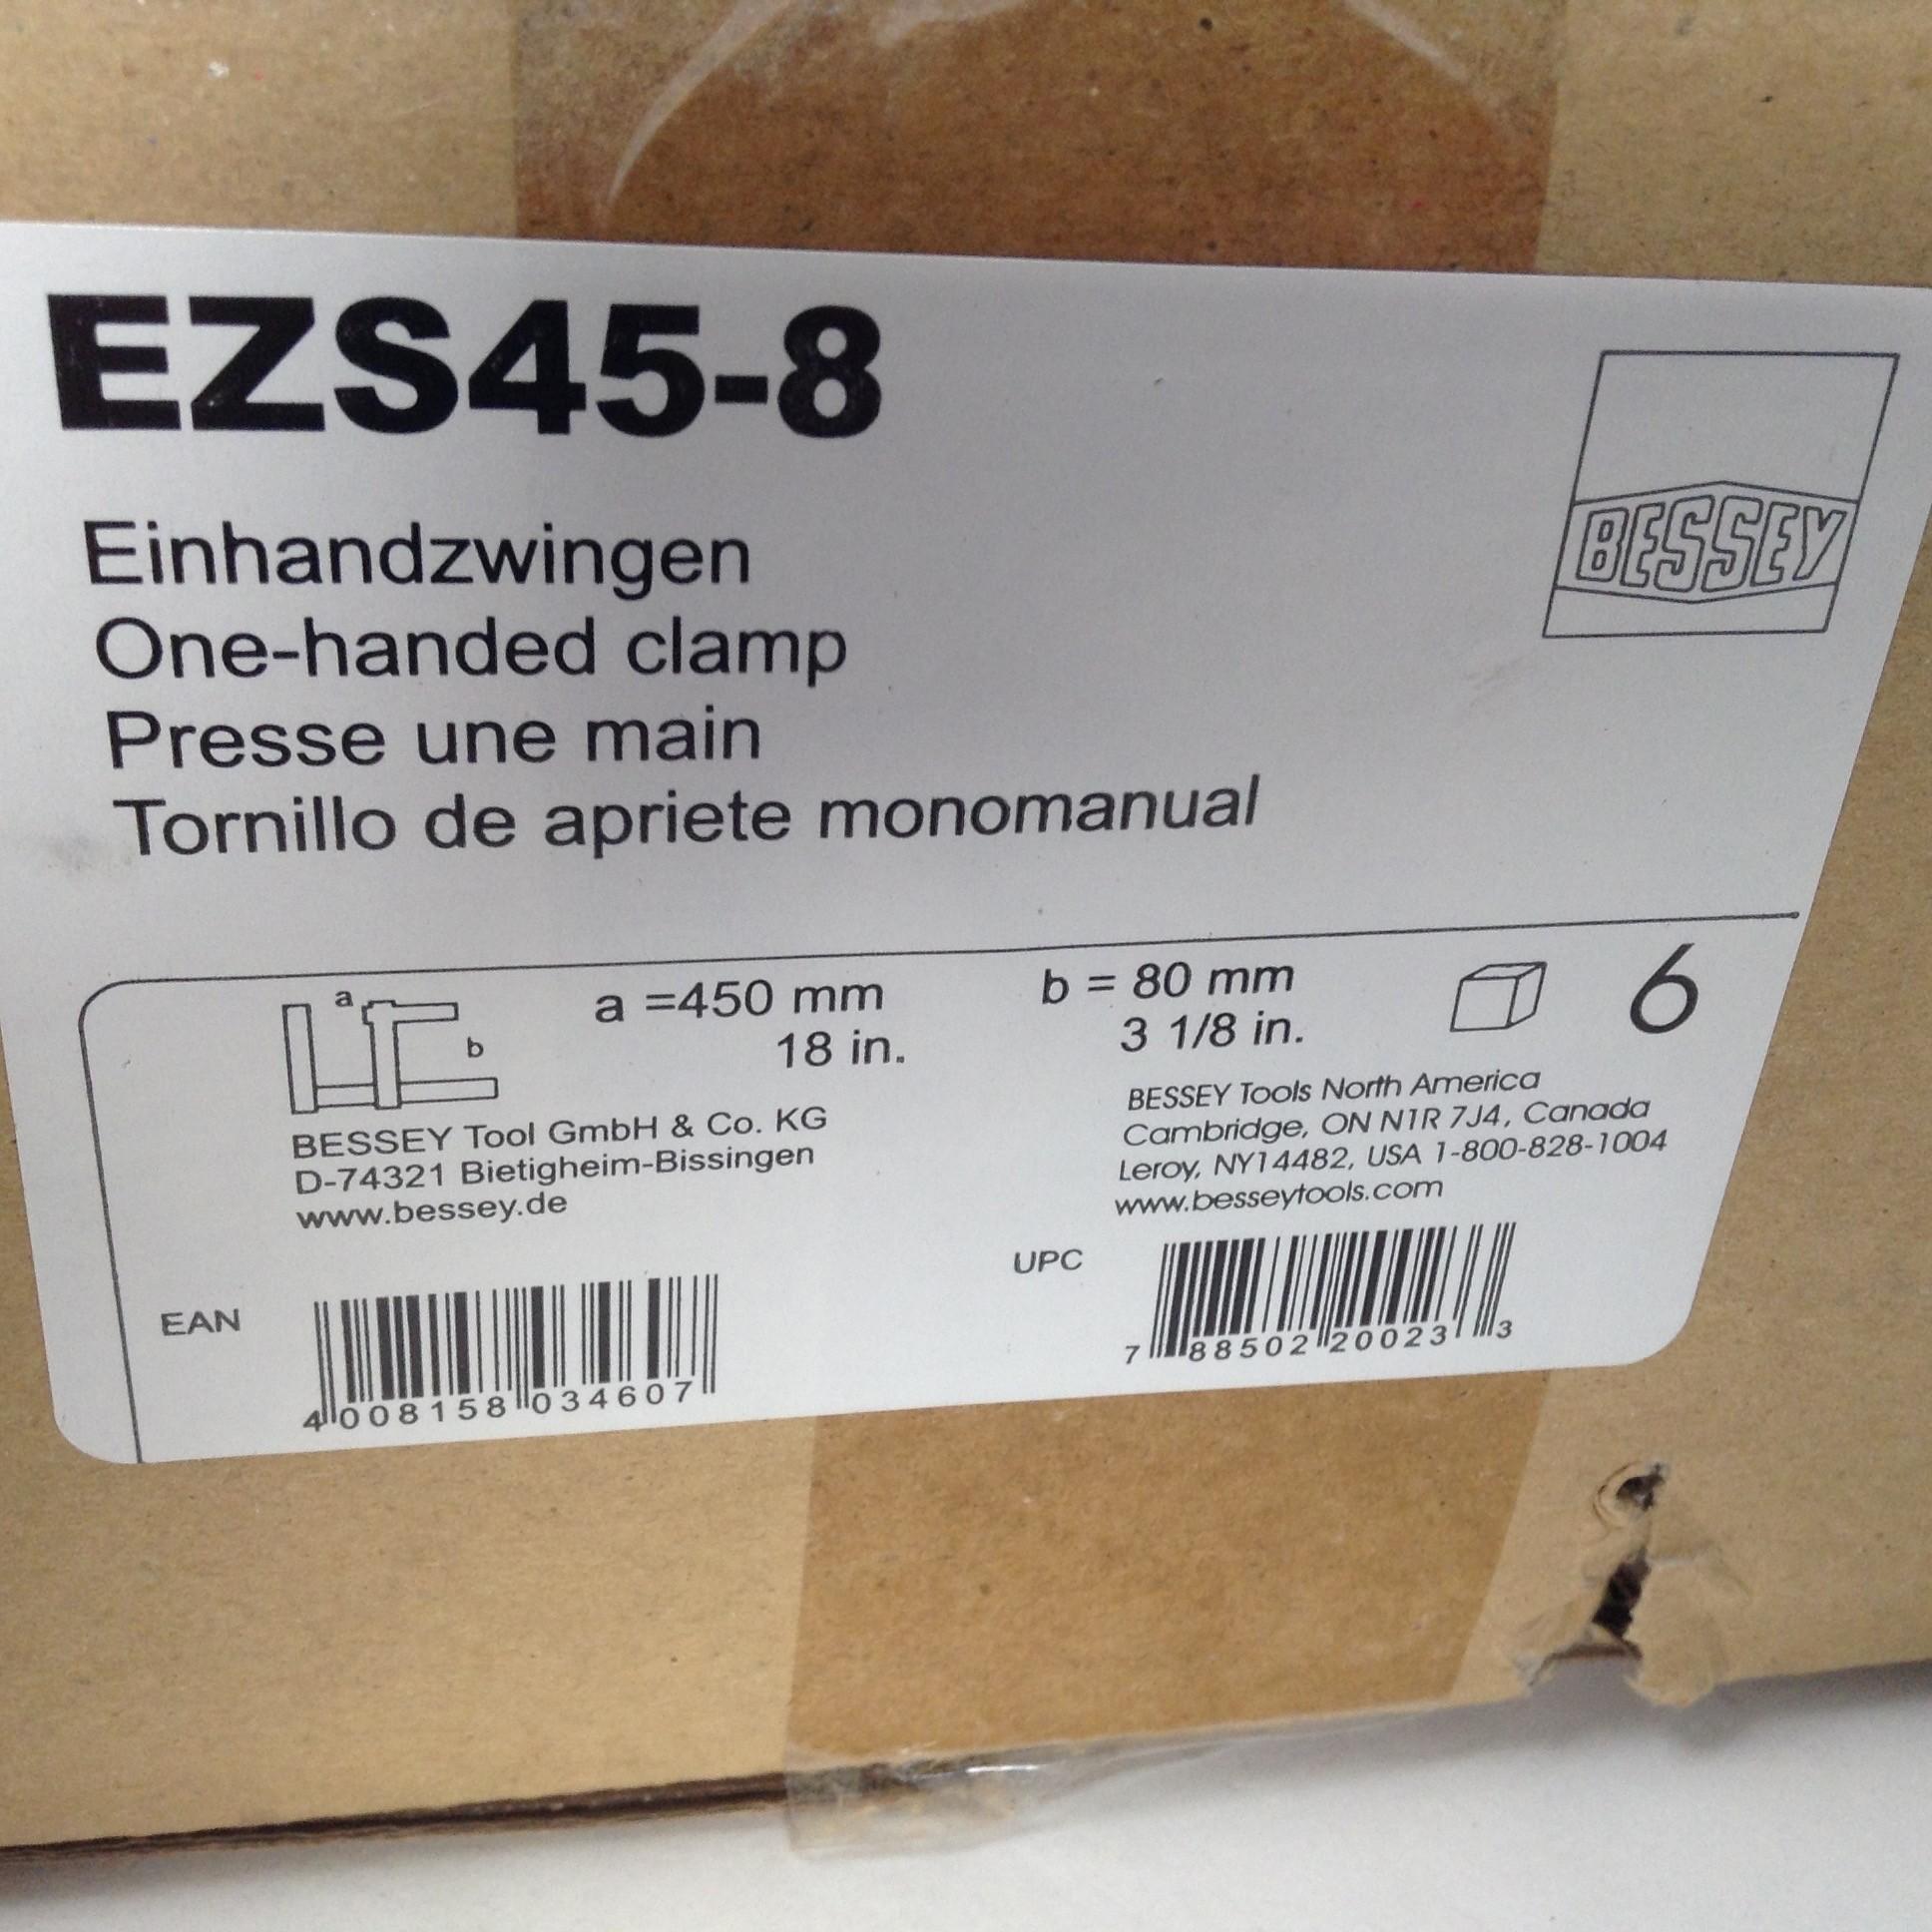 Bessey EZS30-8 Tornillo de apriete monomanual